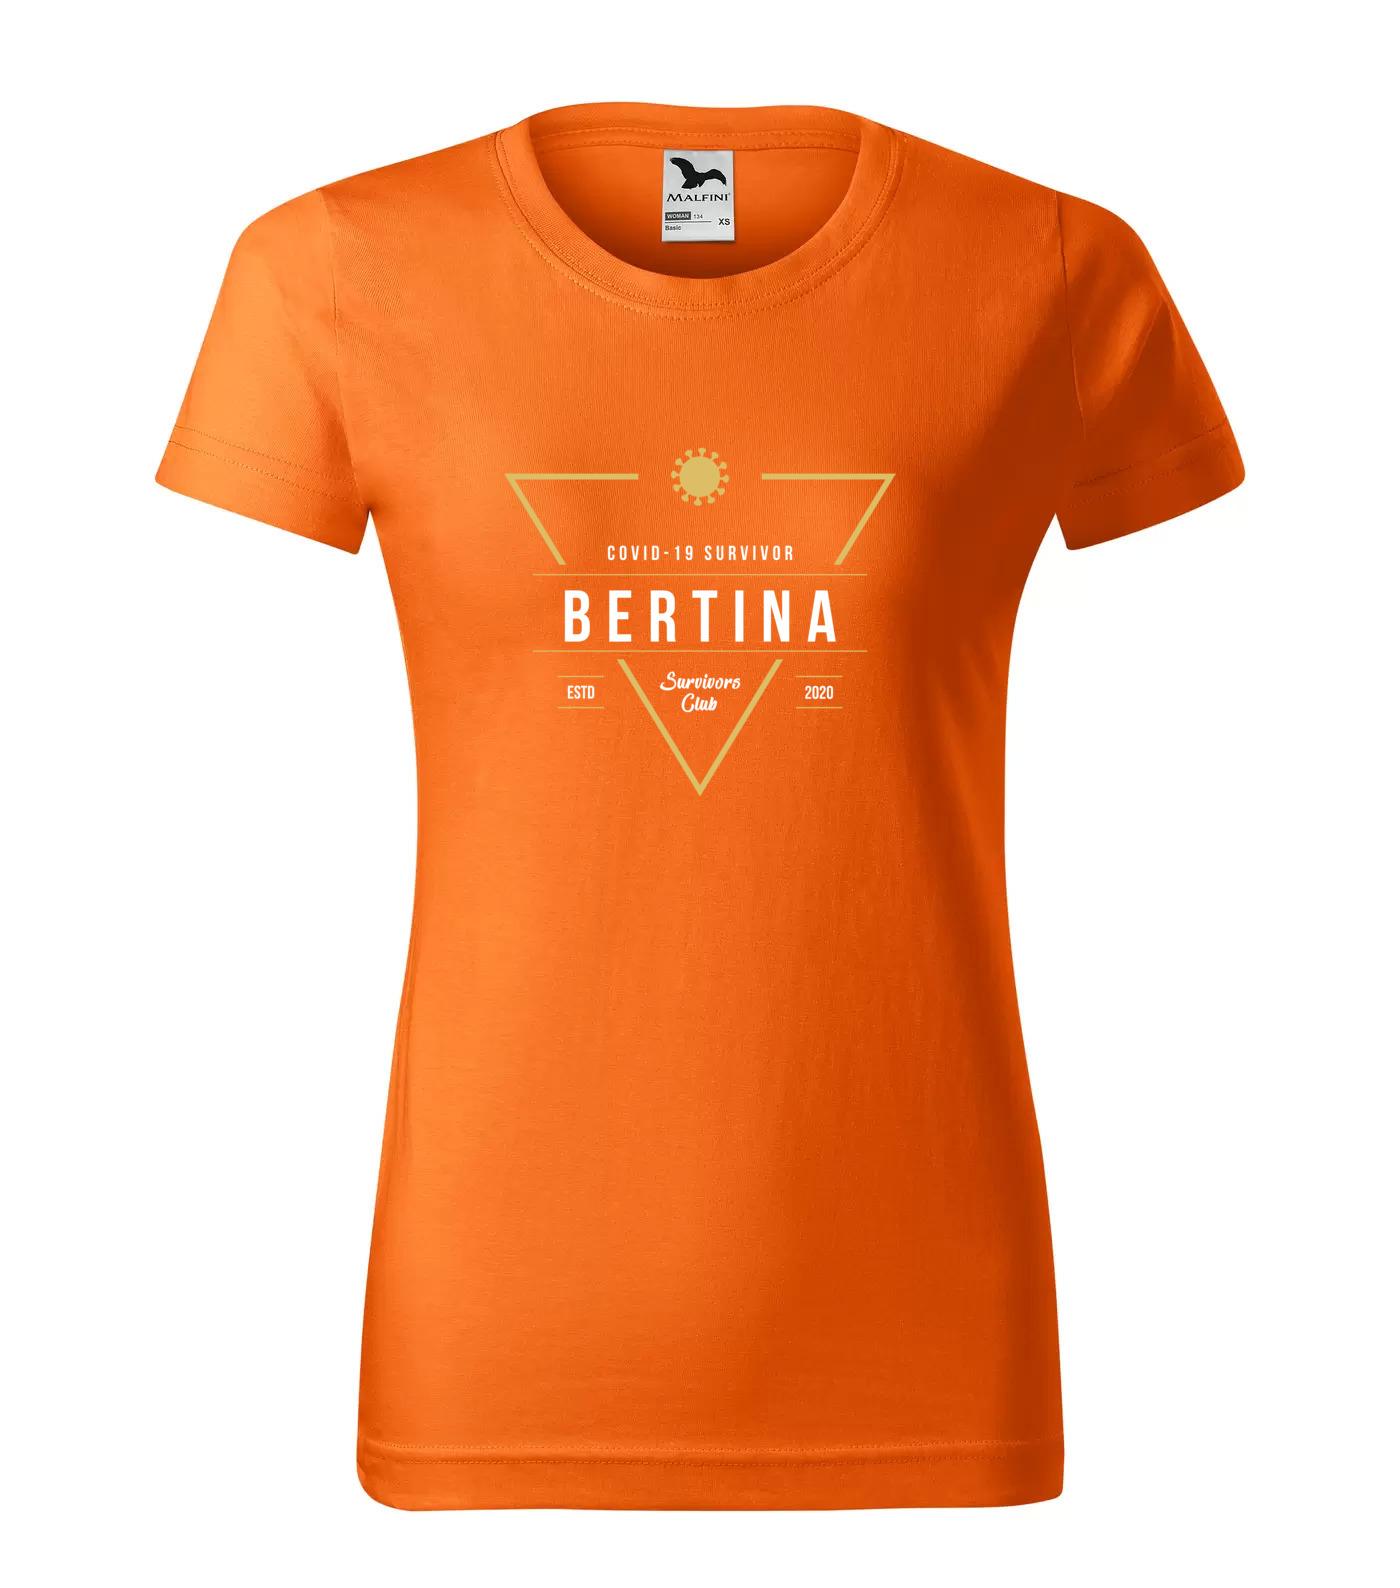 Tričko Survivor Club Bertina